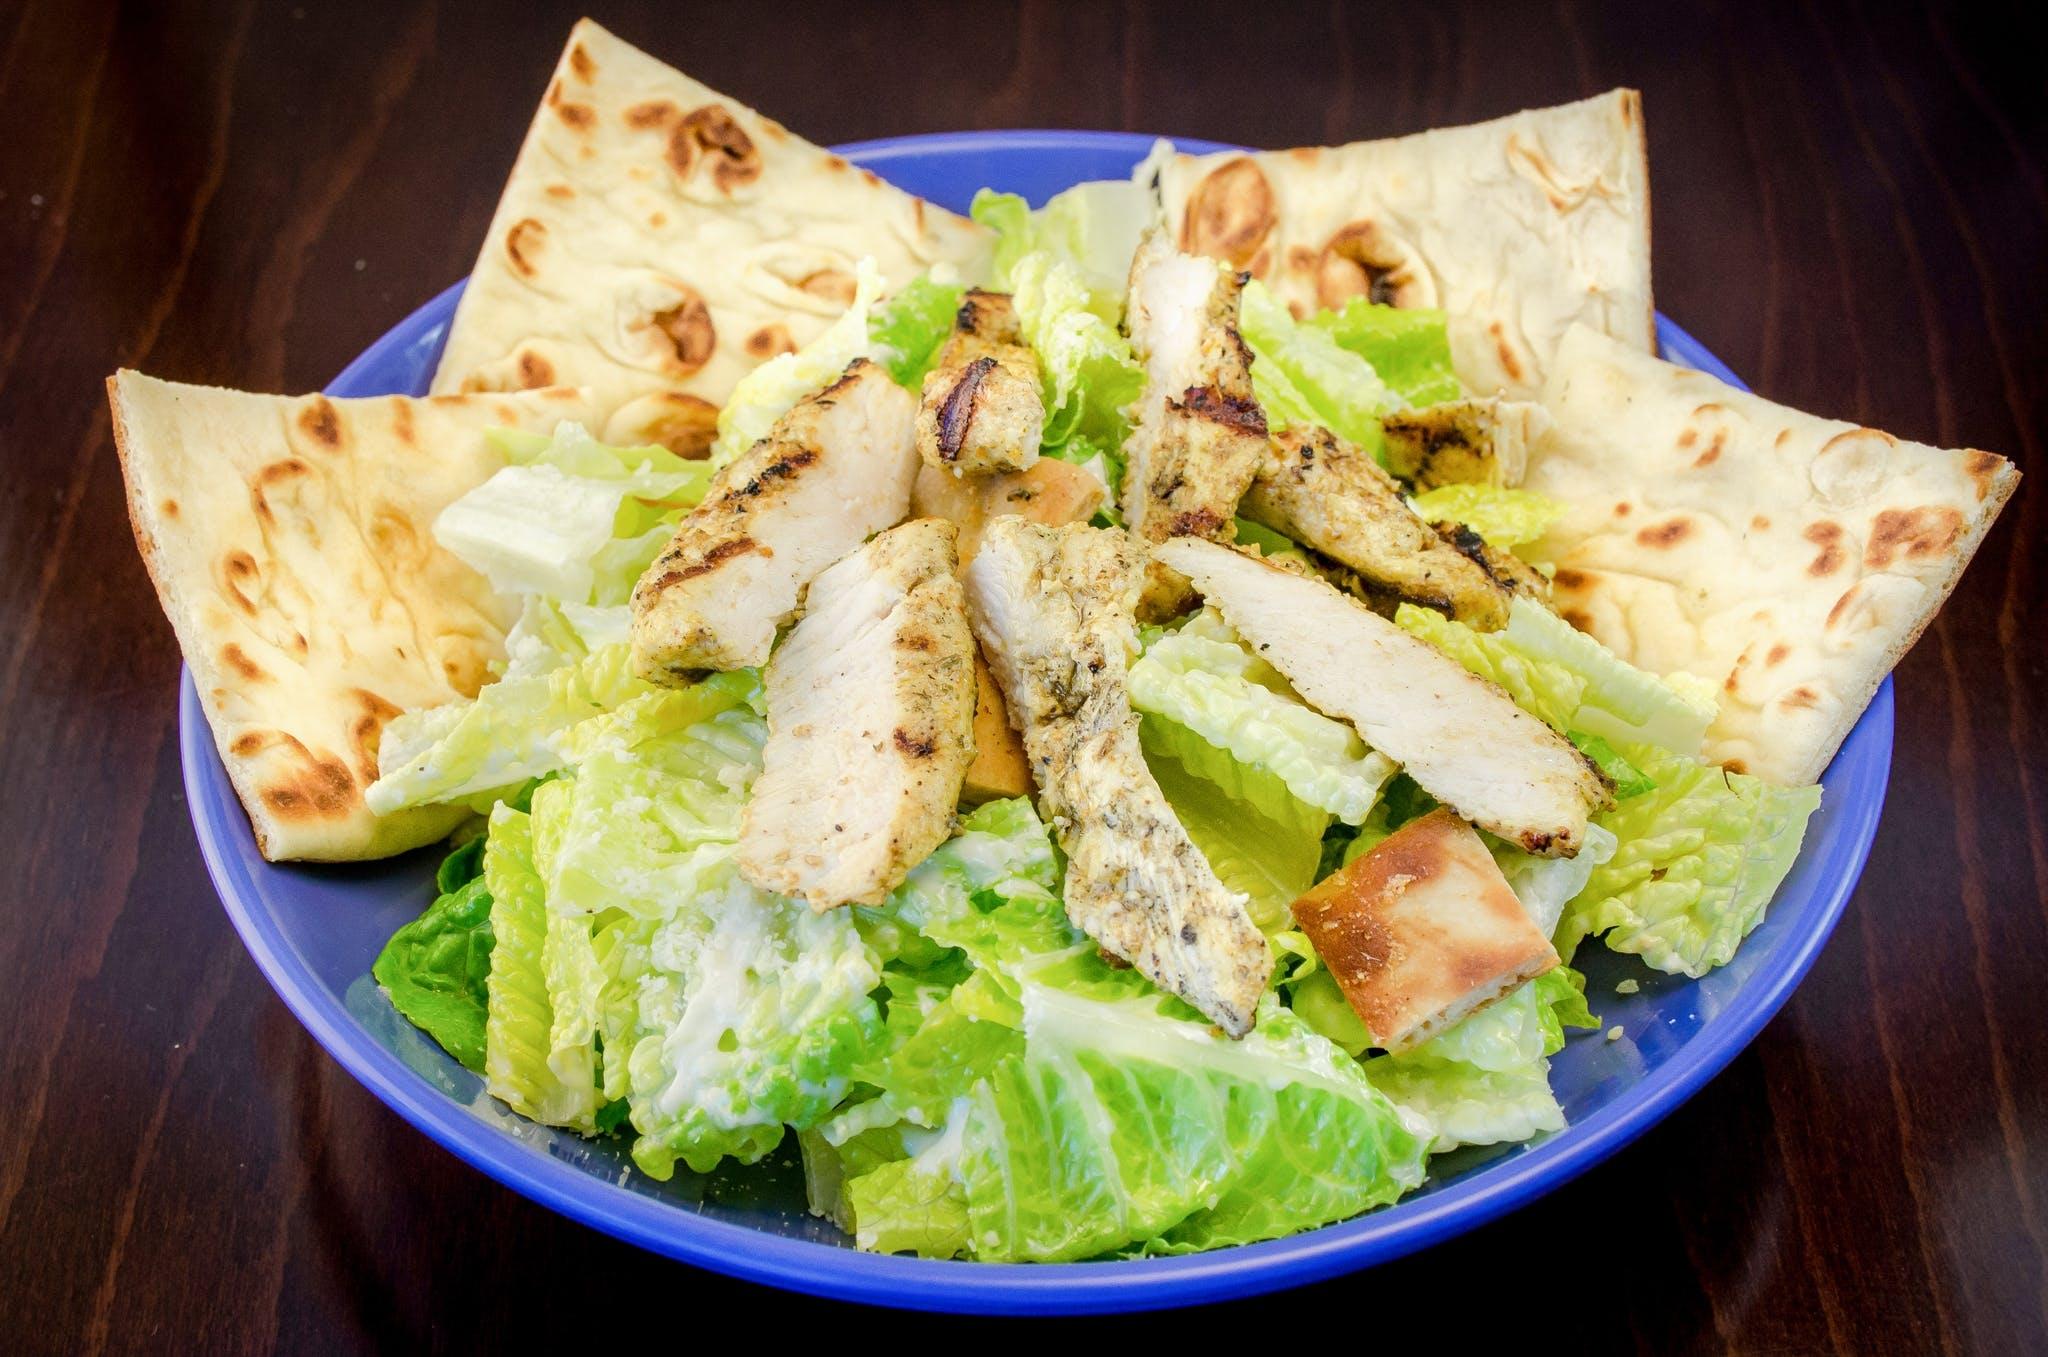 Caesar Salad from Freska Mediterranean Grill in Middleton, WI